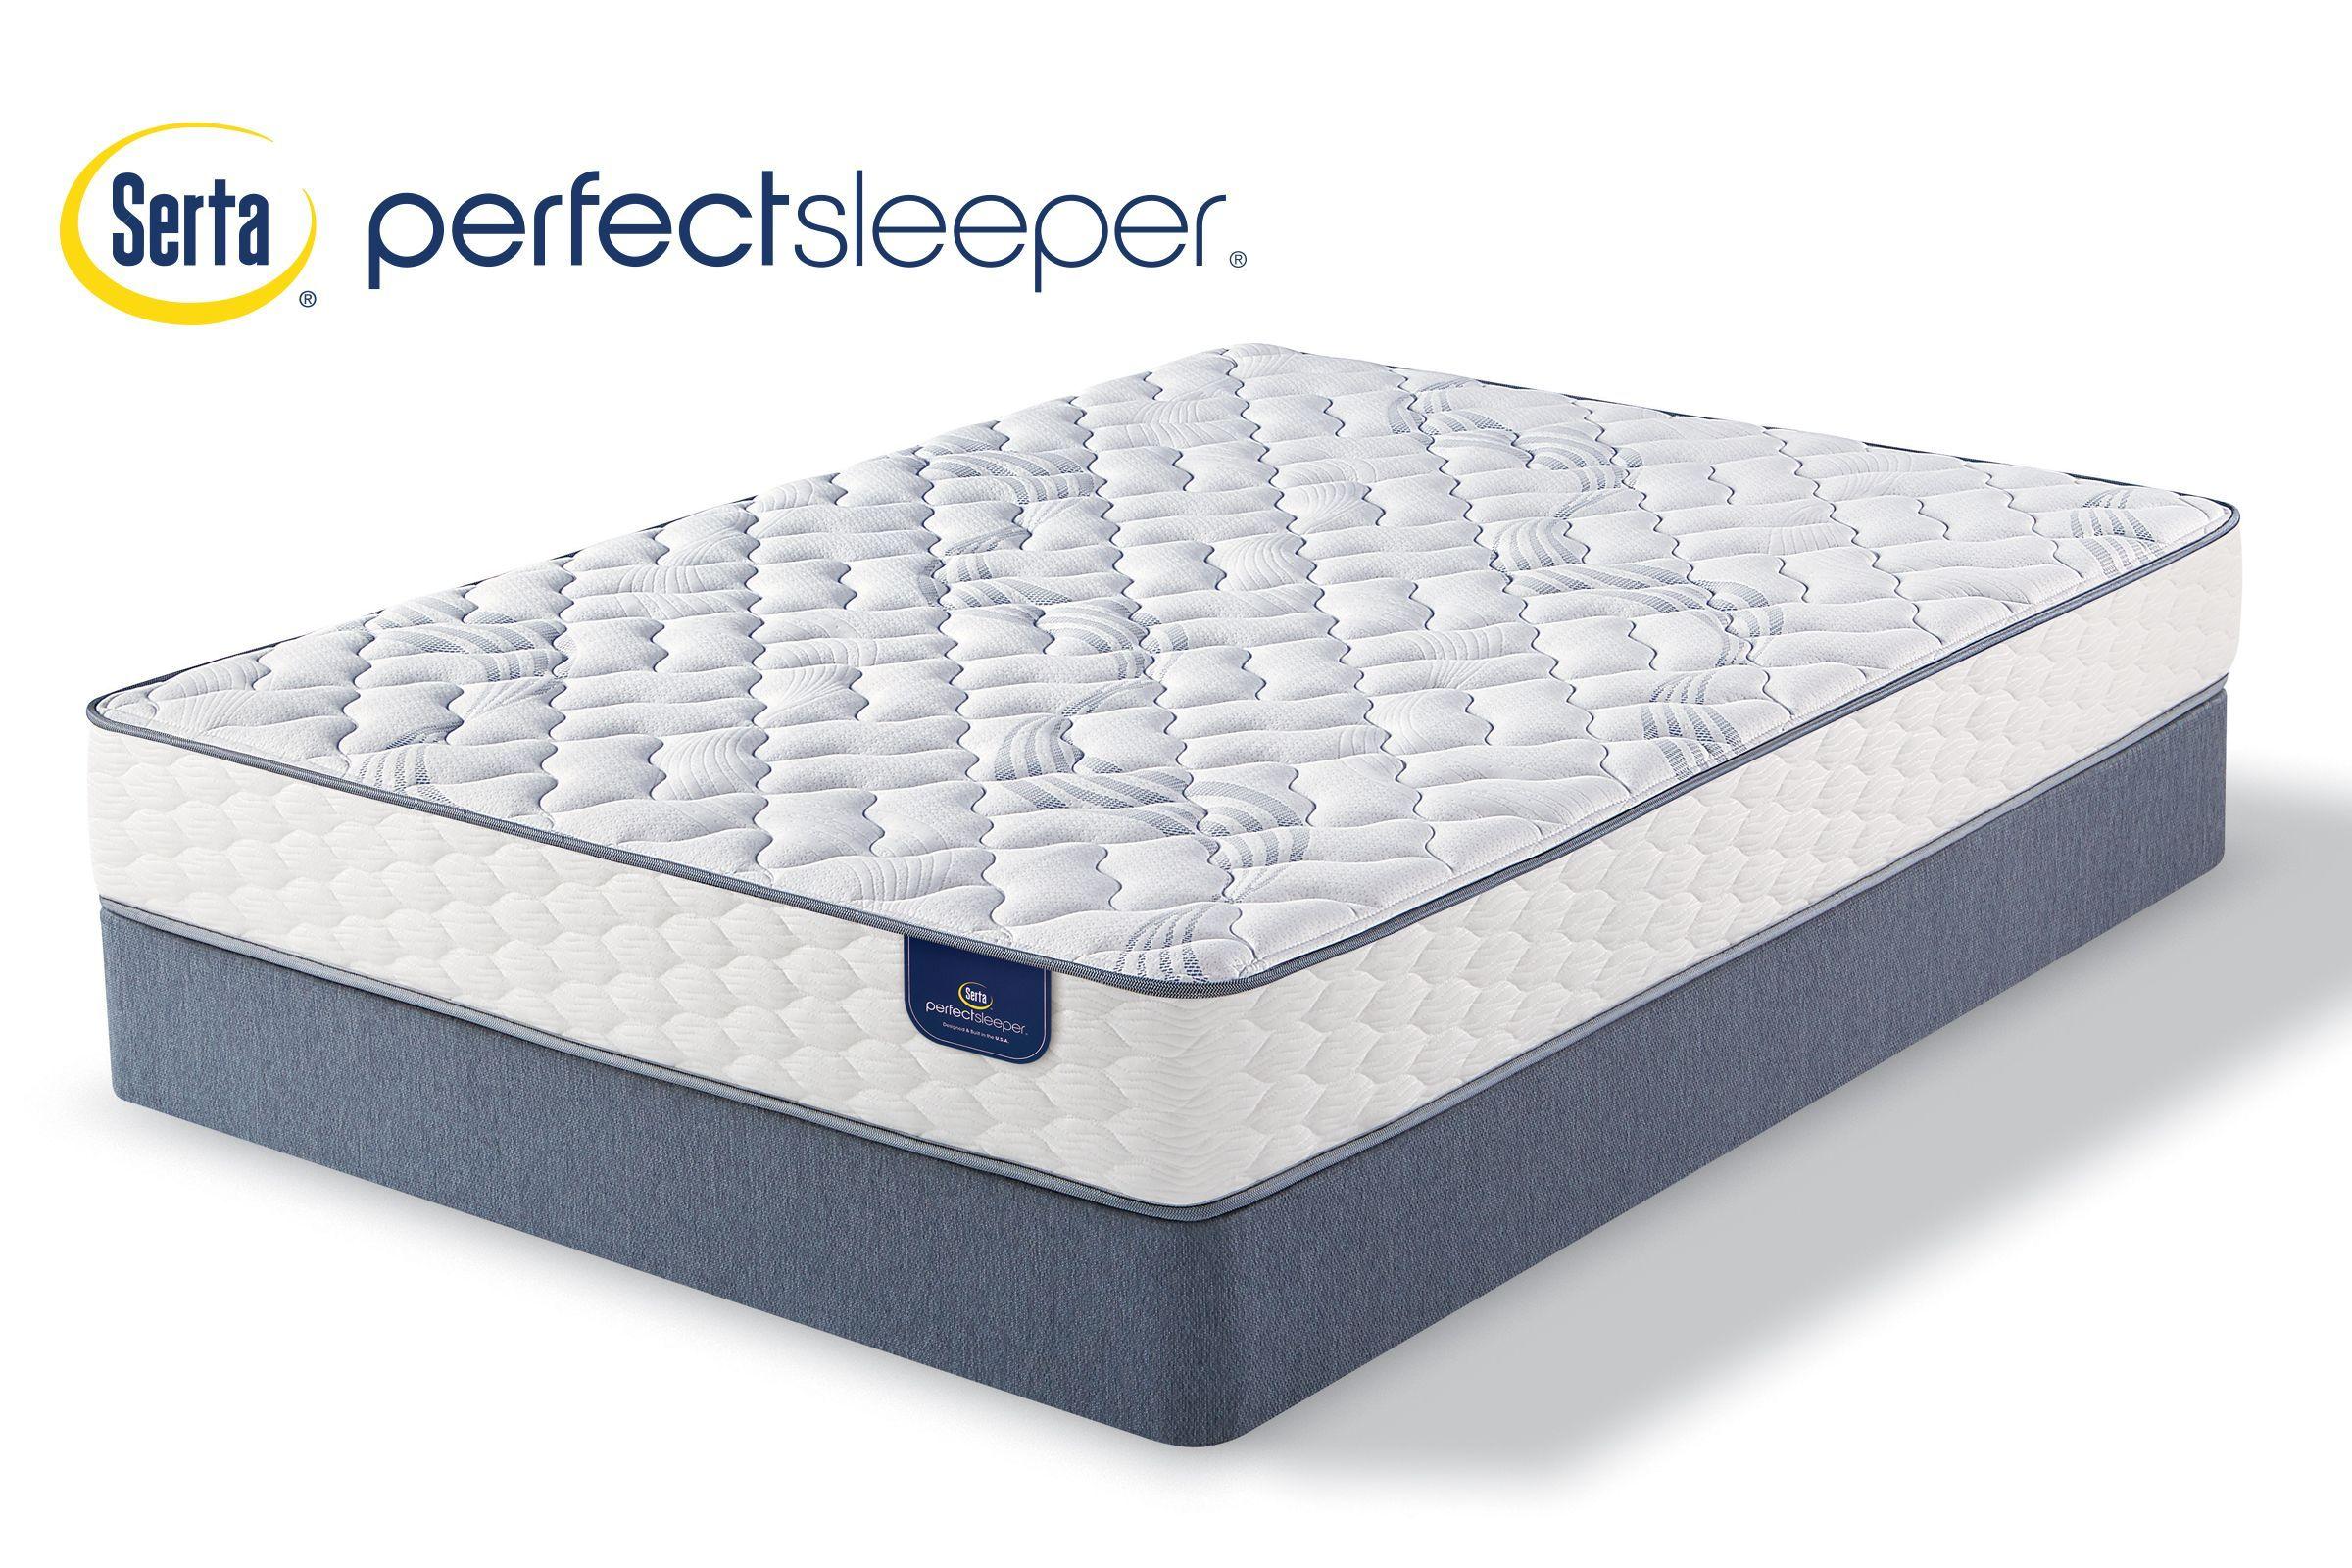 Serta Perfect Sleeper Romberg Firm King Mattress With 2 Low